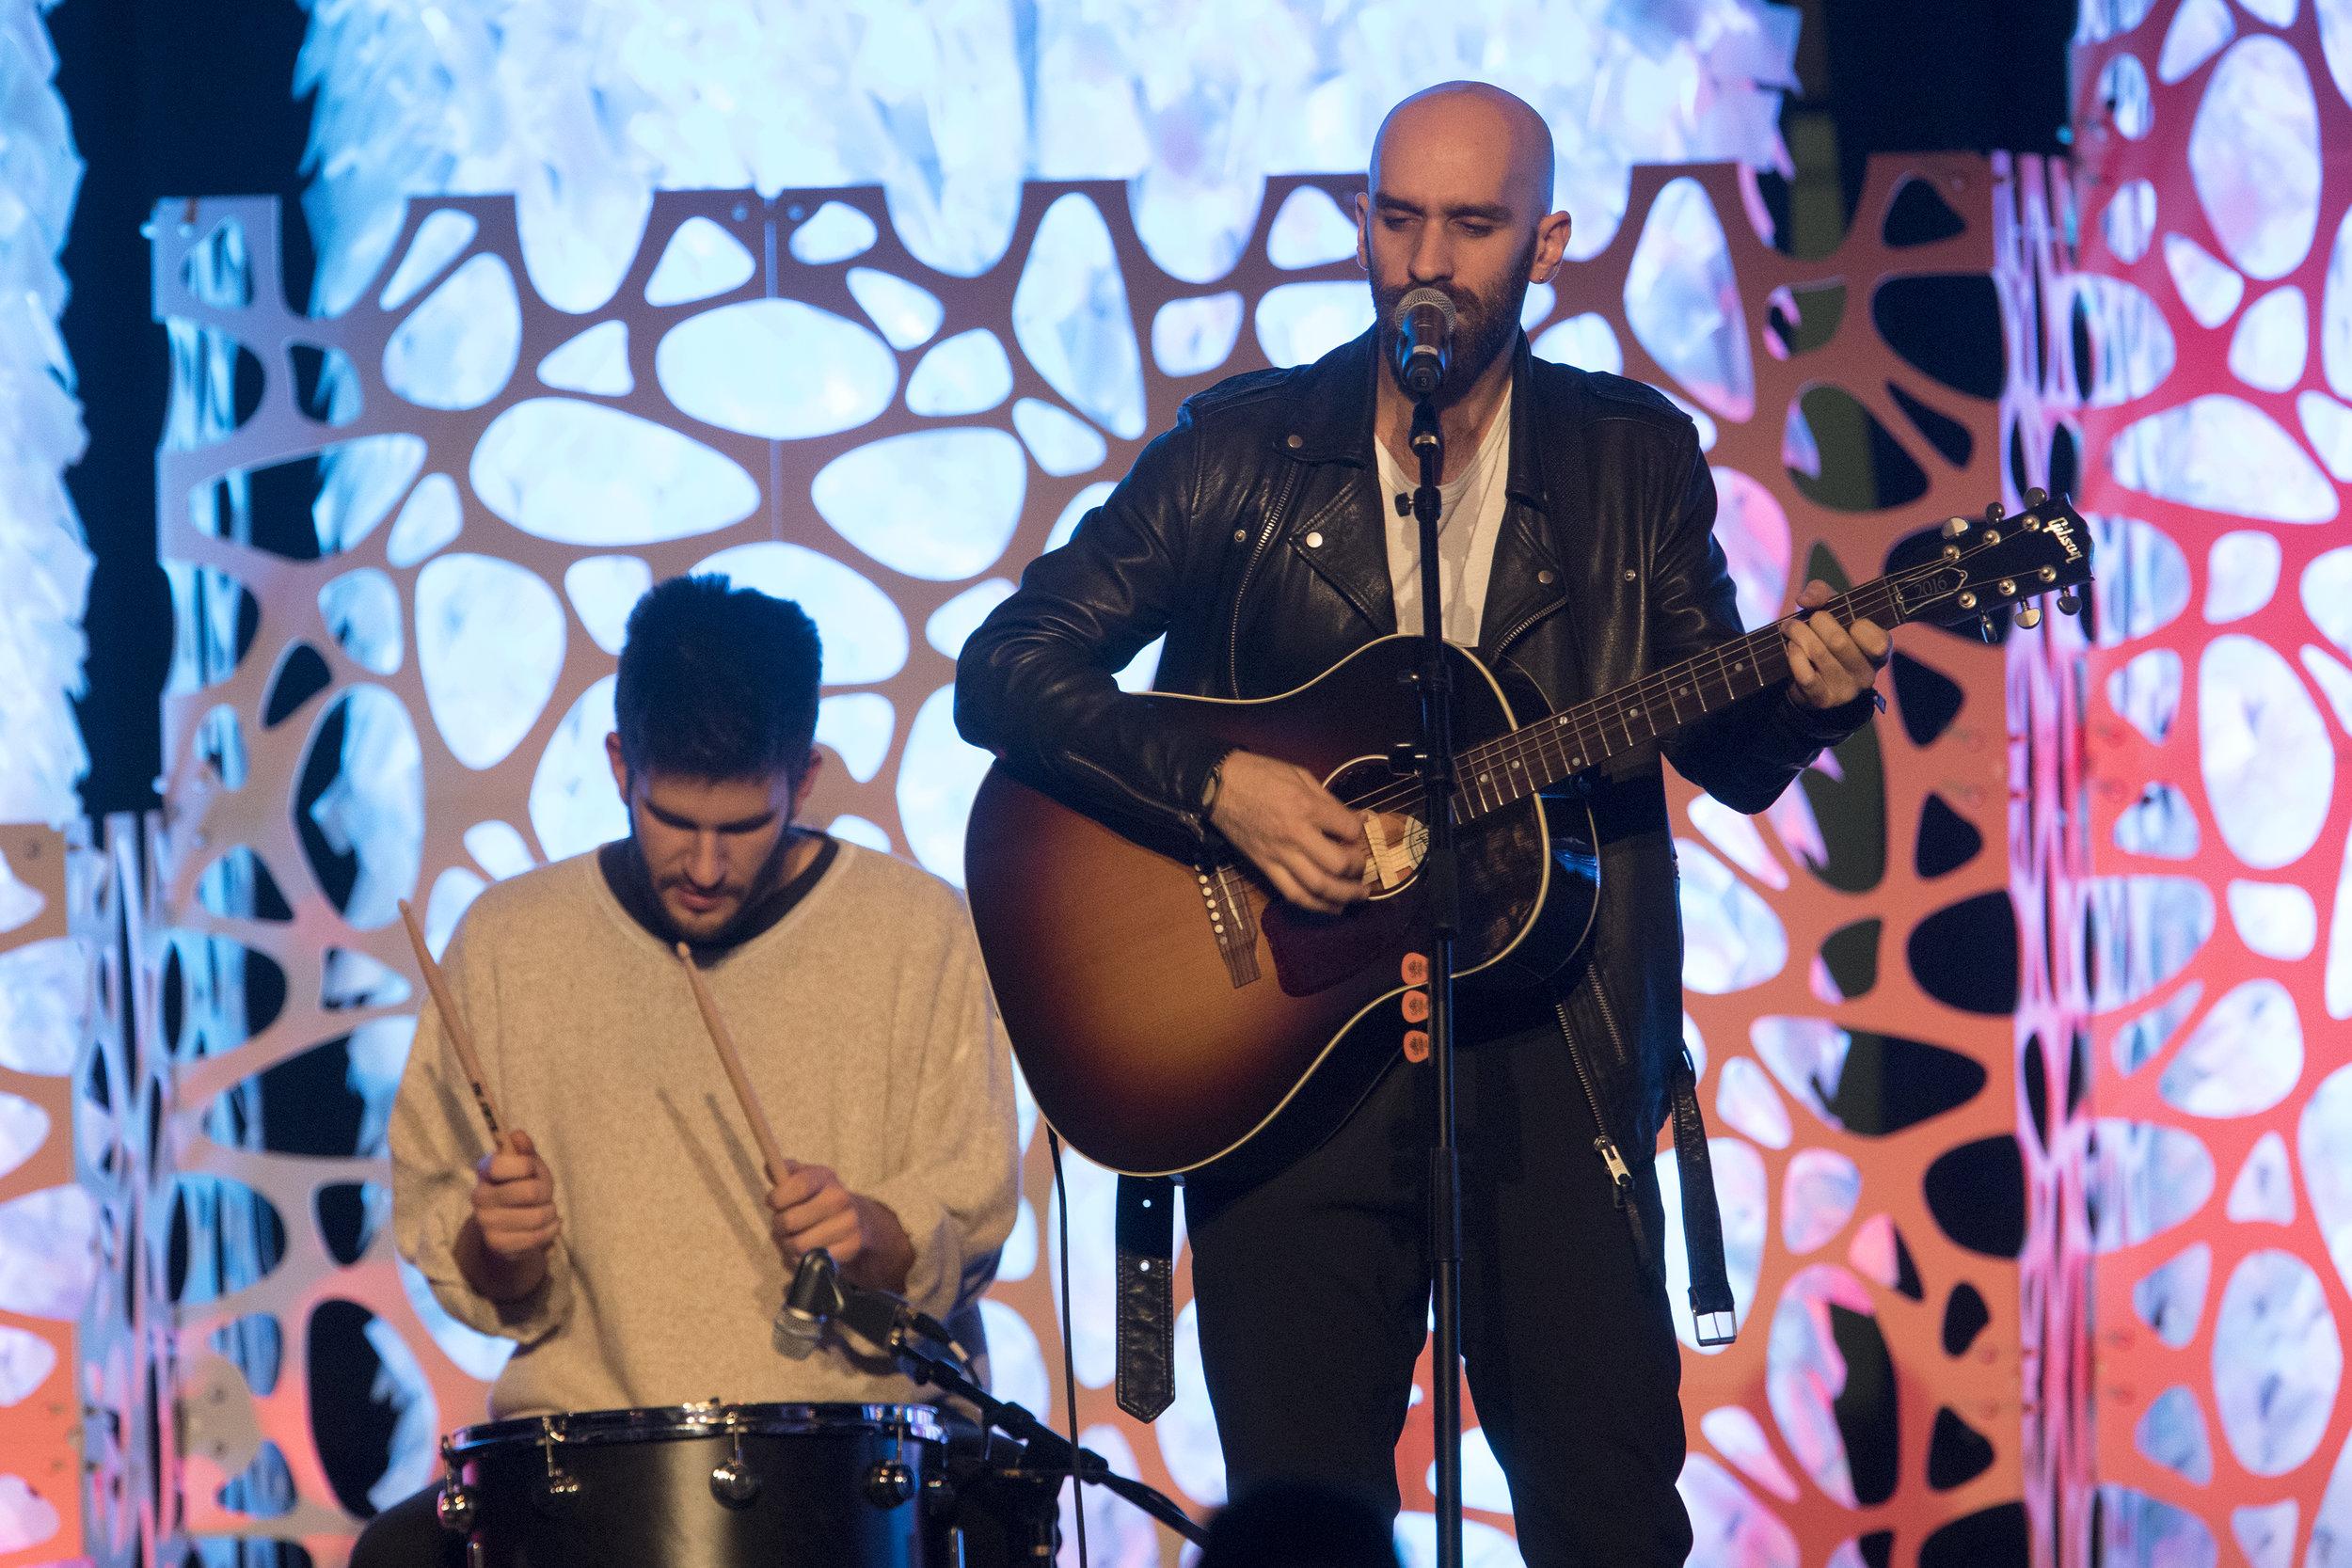 X Ambassadors perform at Make-A-Wish LA Gala